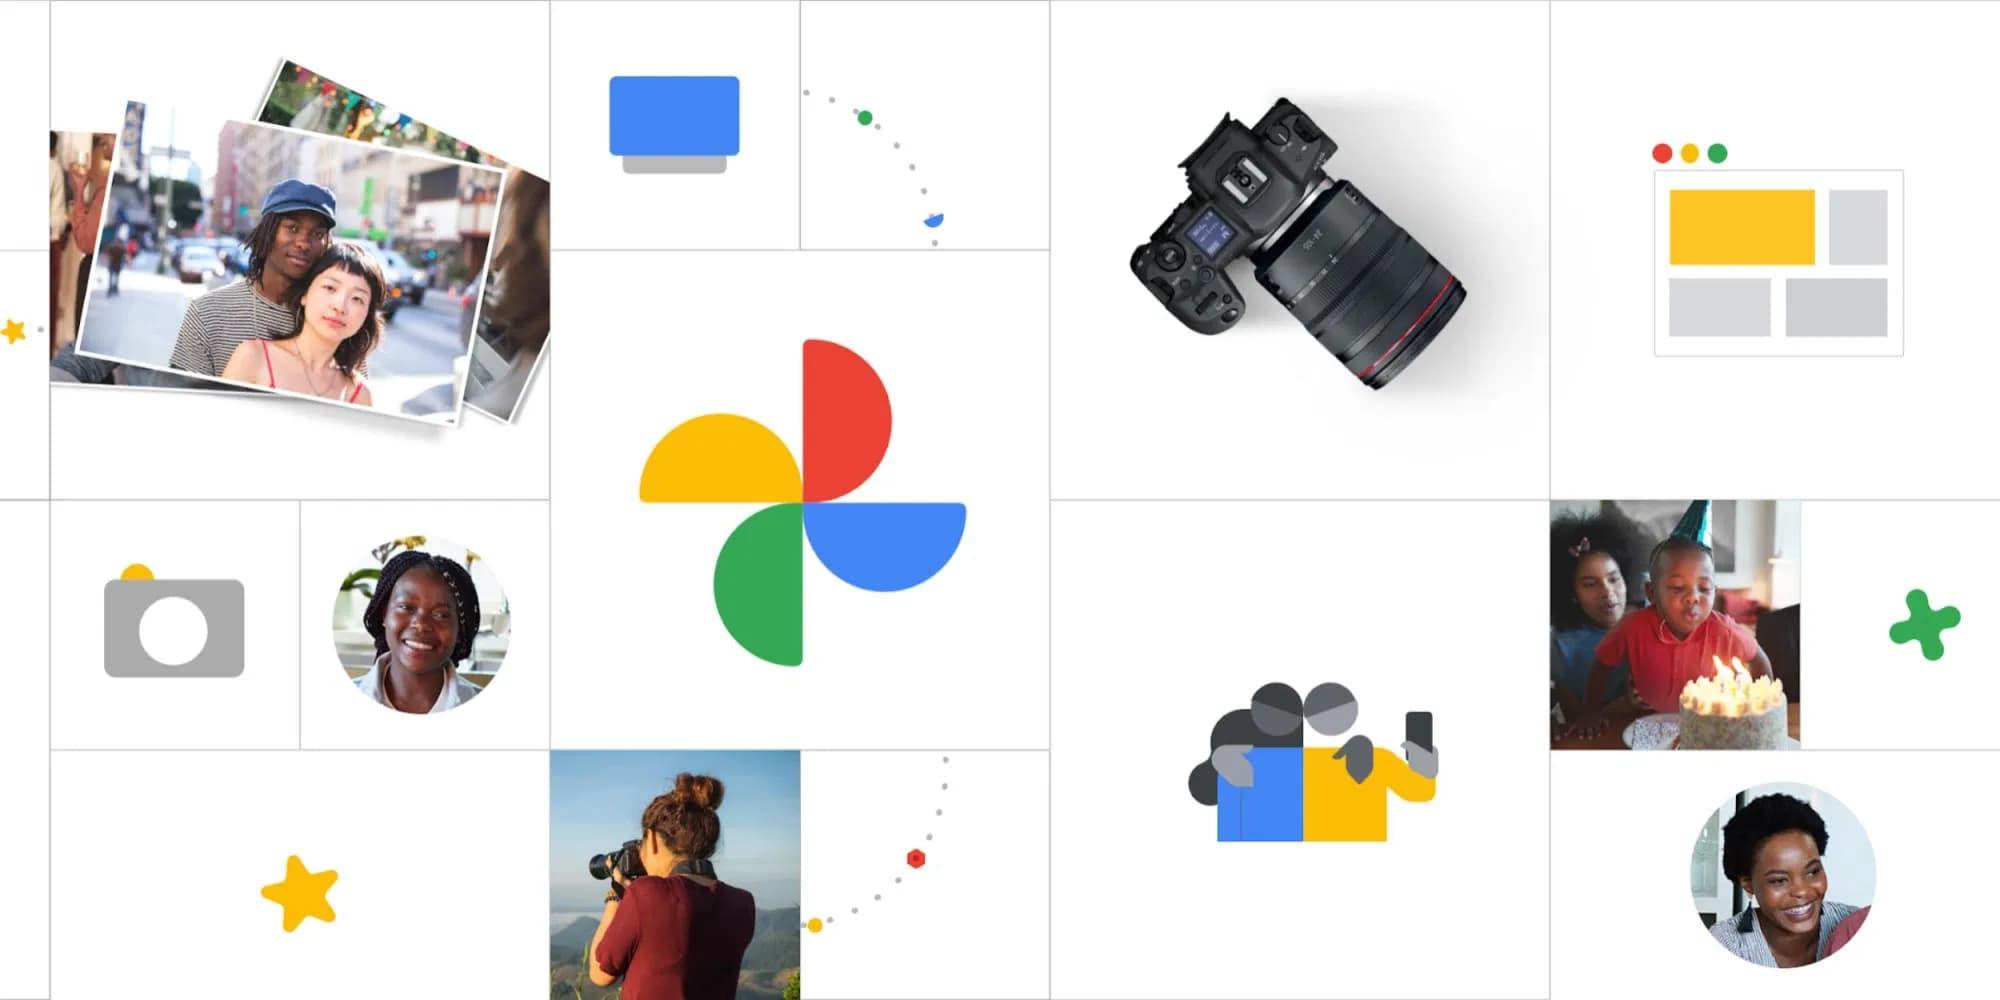 Il restyling diGoogle Fotosta arrivando anche sui tablet Android (foto)